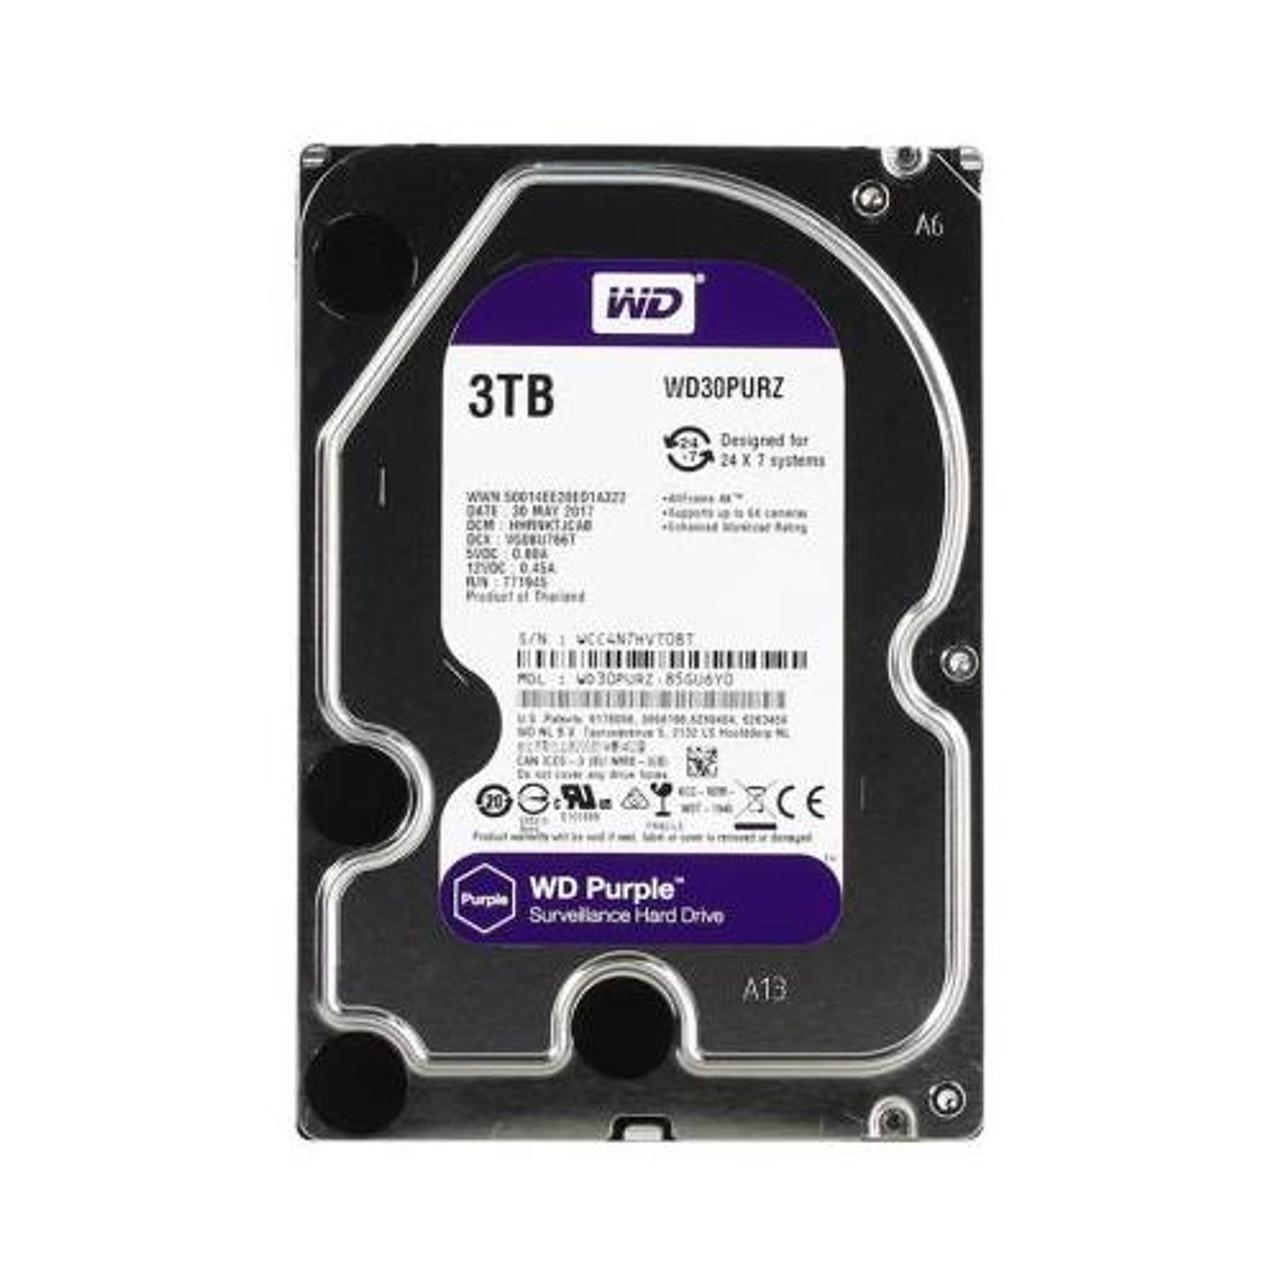 WD3200BEVT-00ZAT0 Western Digital 320GB 5400RPM SATA 3.0 Gbps 2.5 inch Scorpio Hard Drive